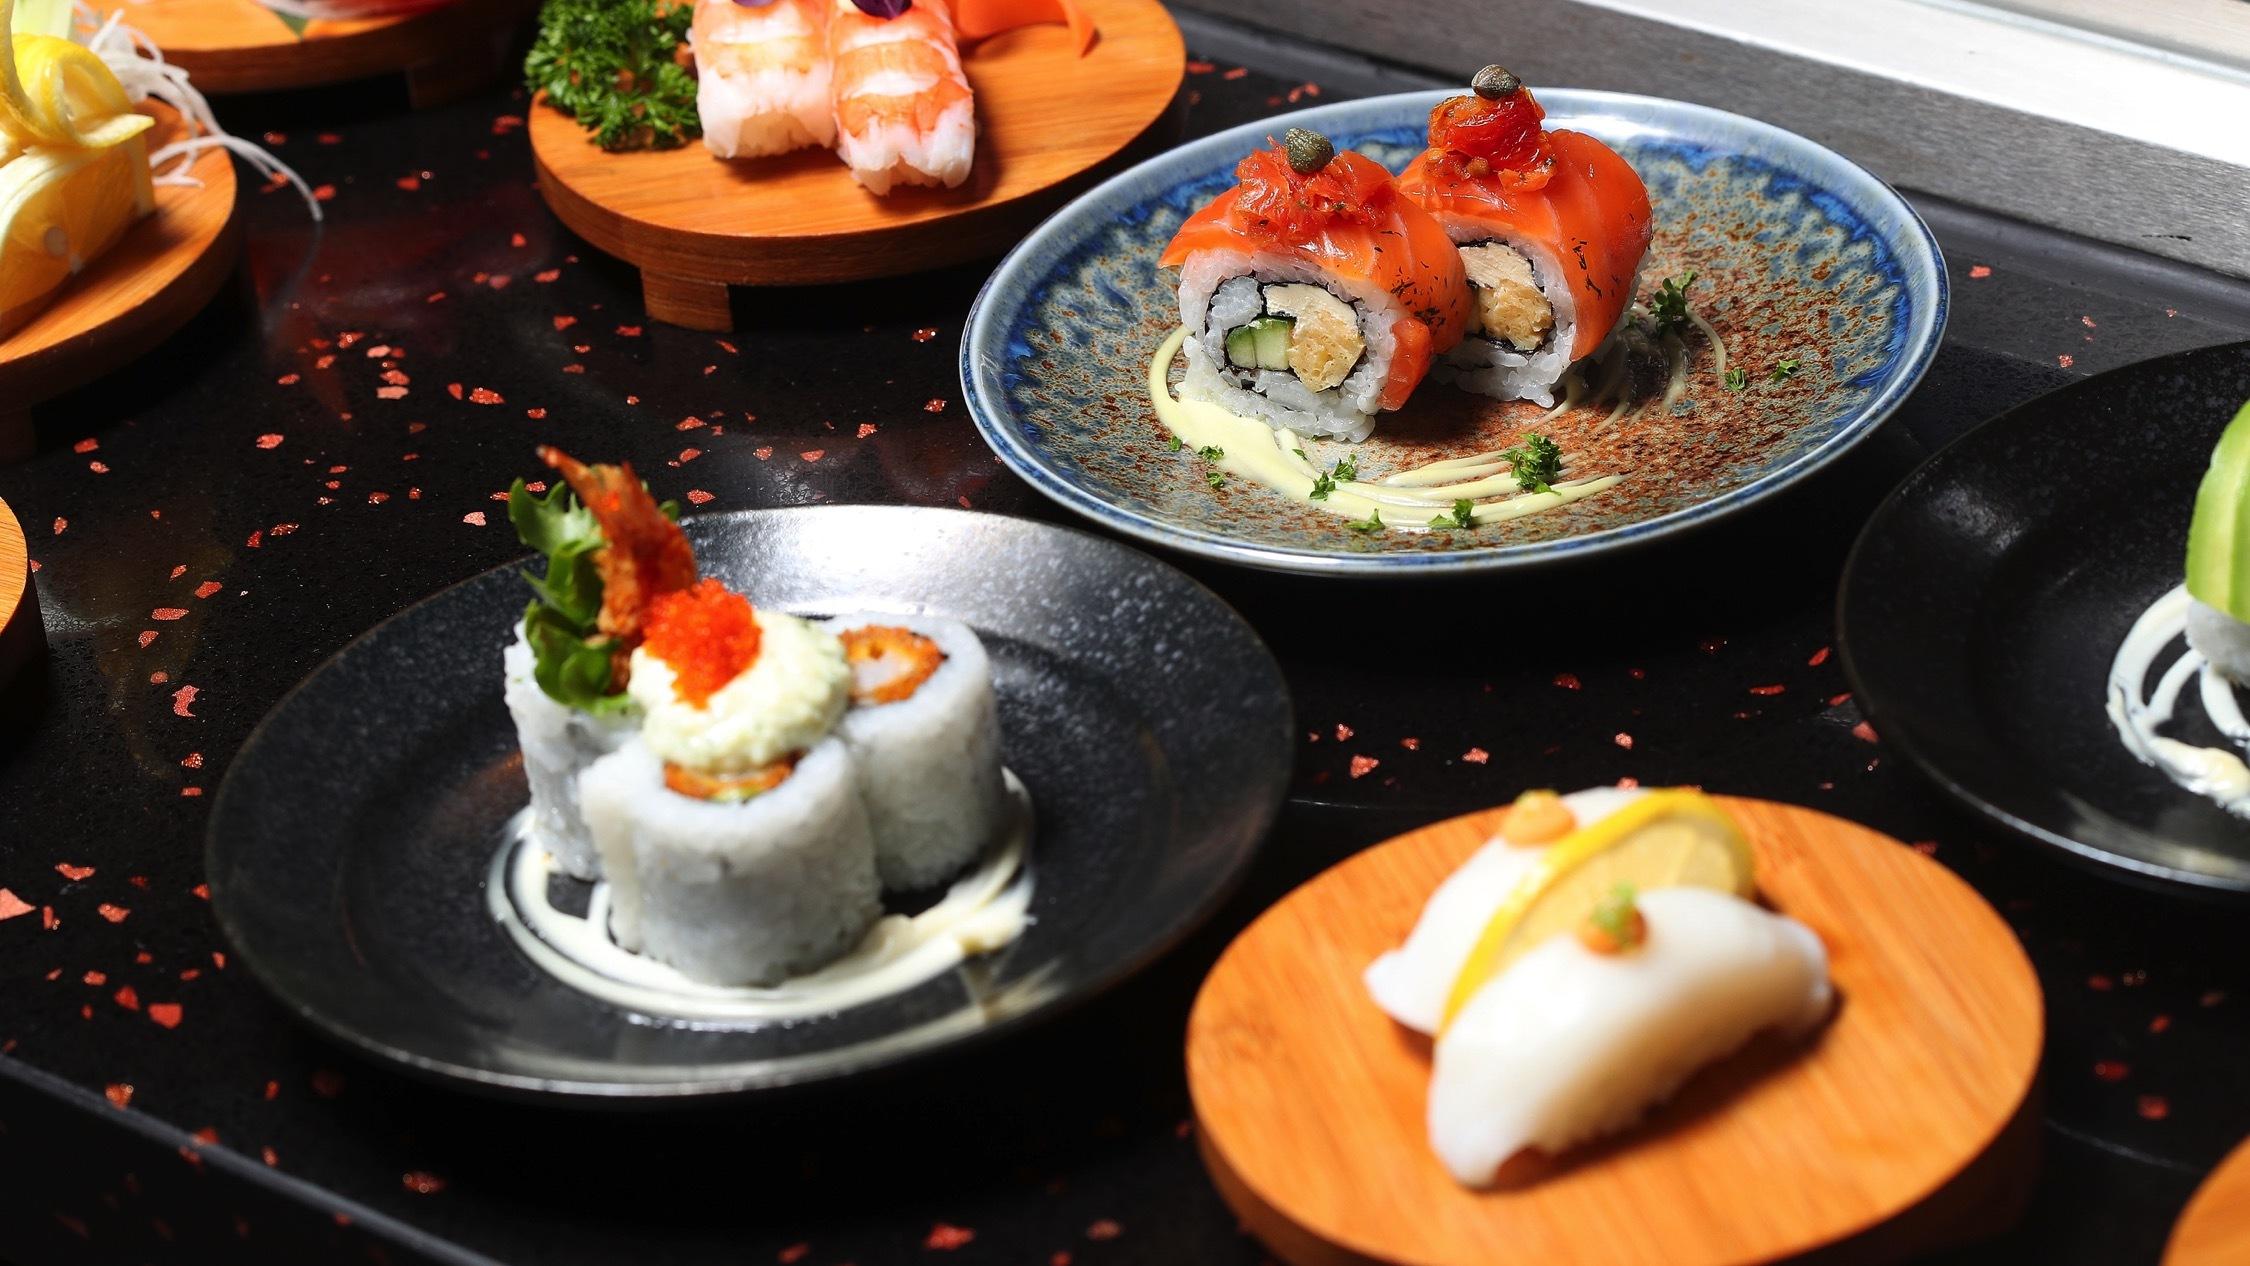 Food at Ganbare Kaz